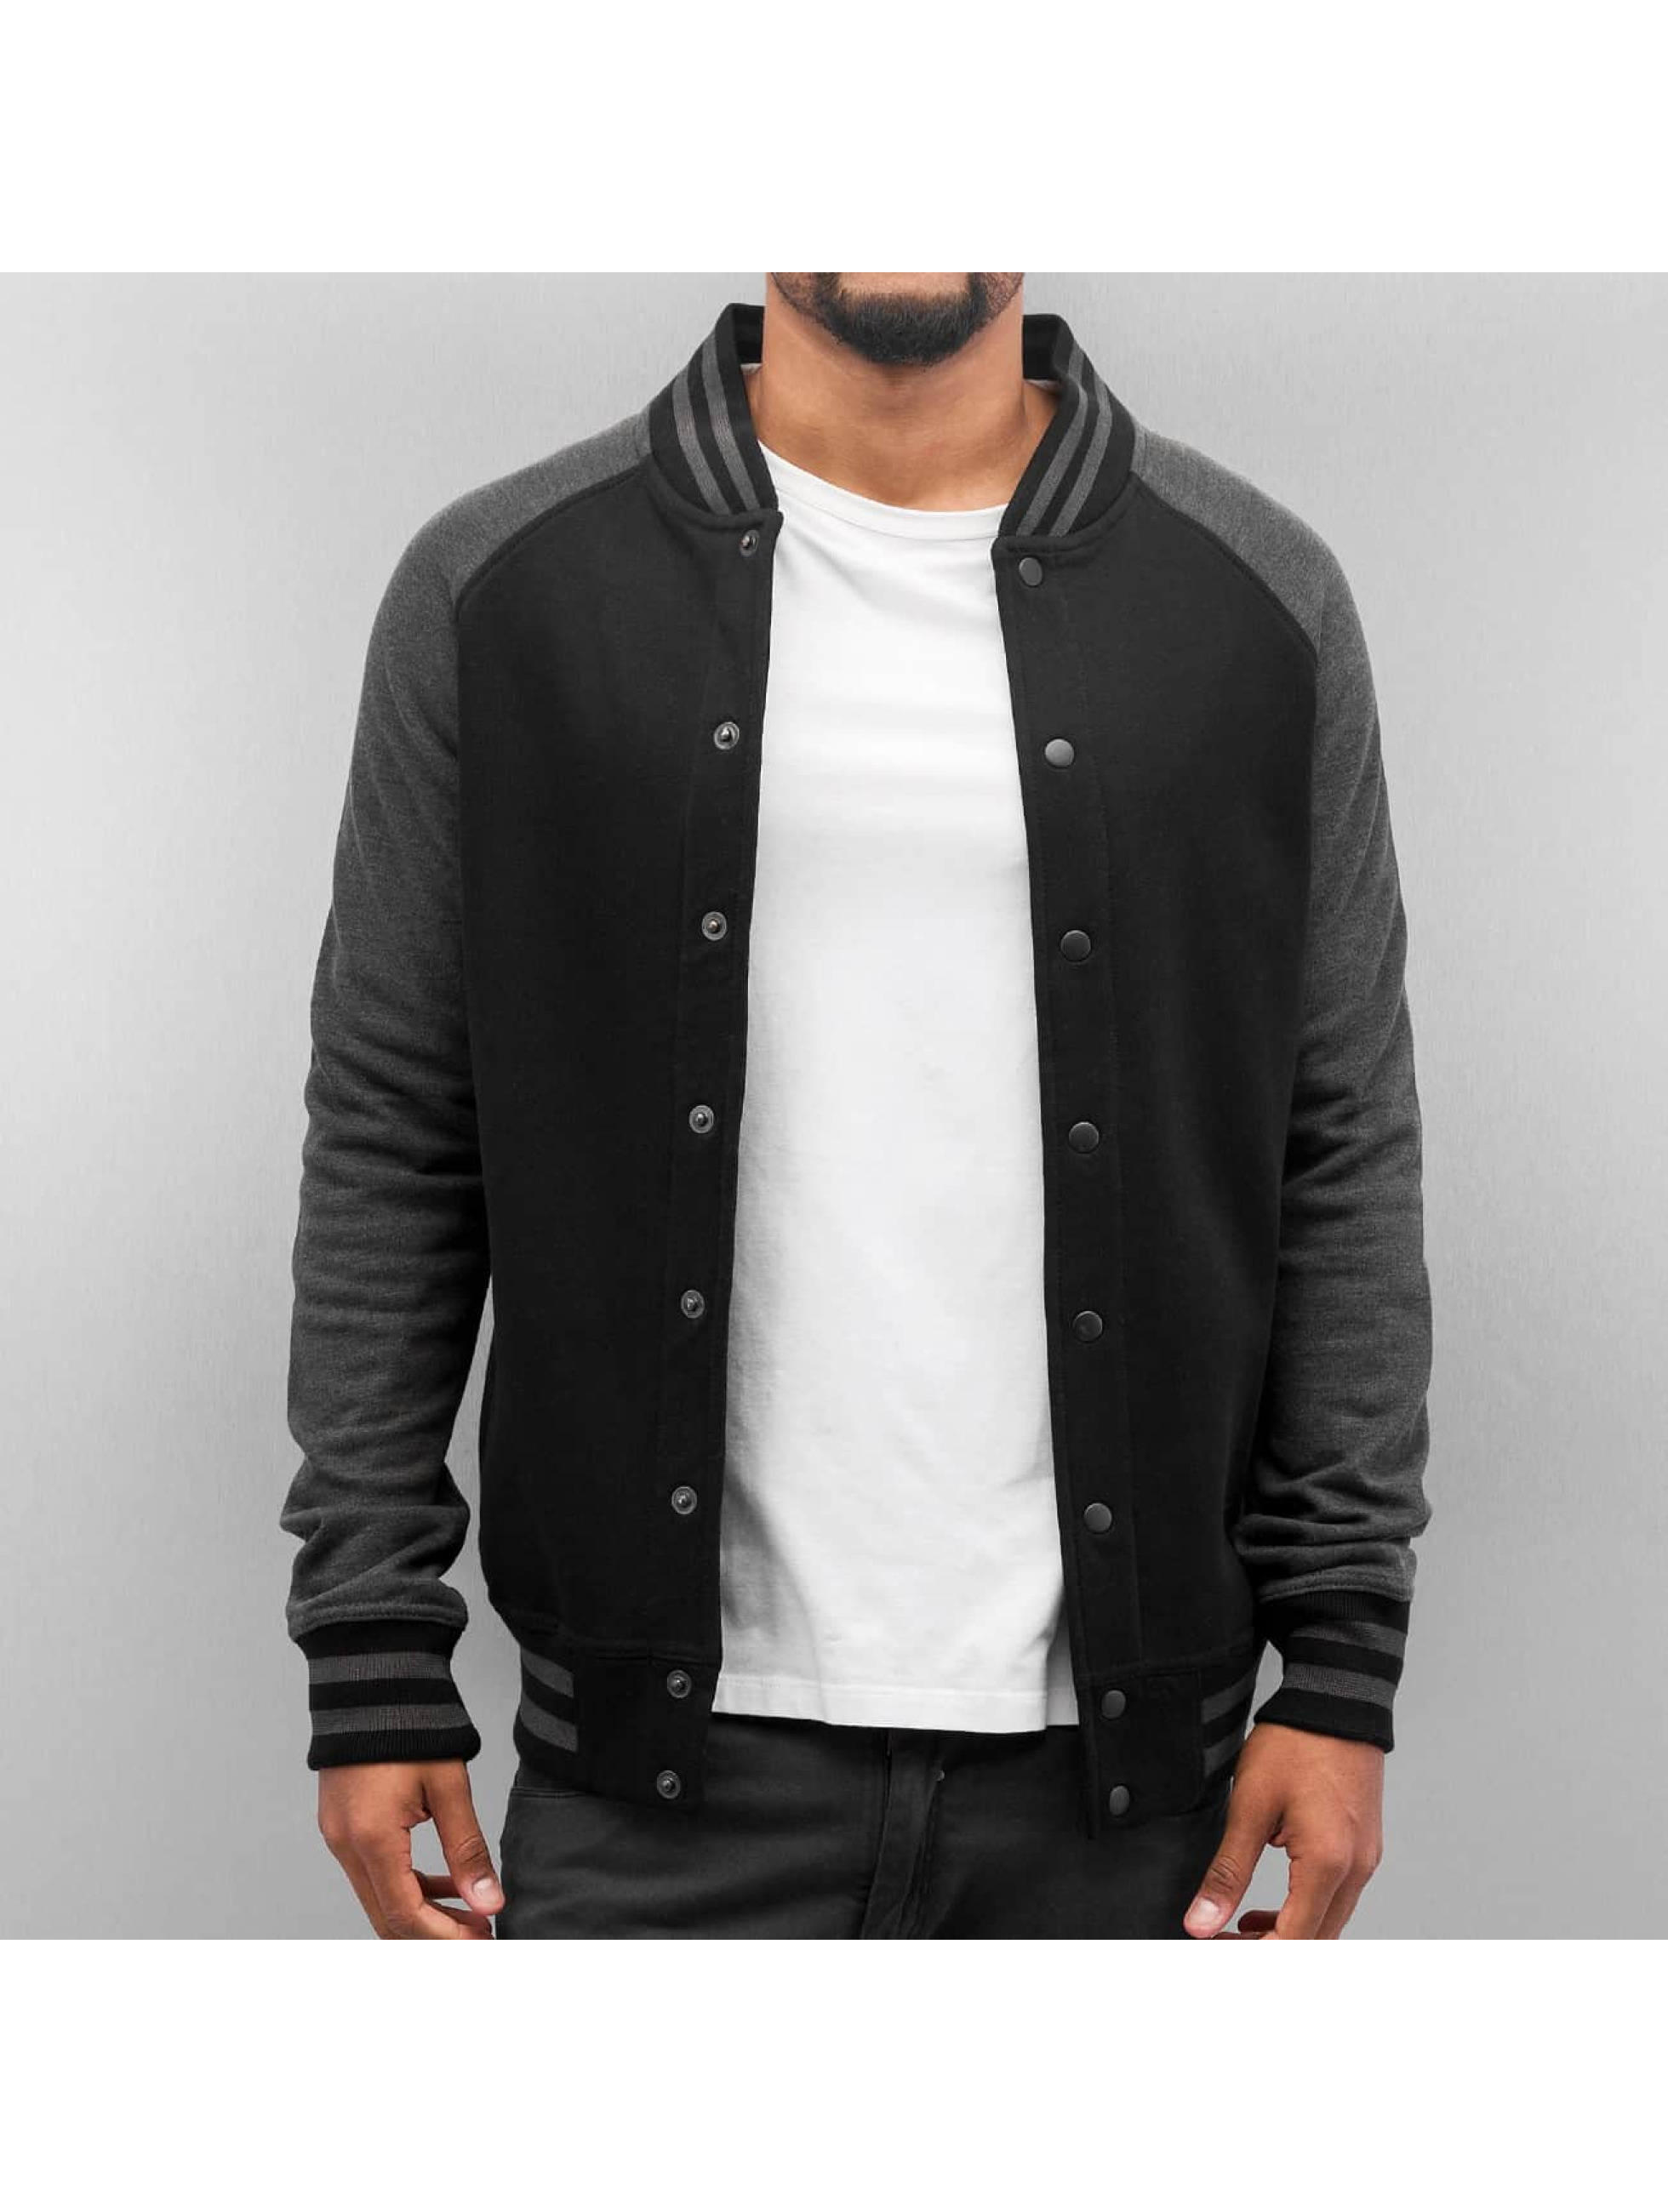 Cyprime Raglan College Jacket Black Anthracite